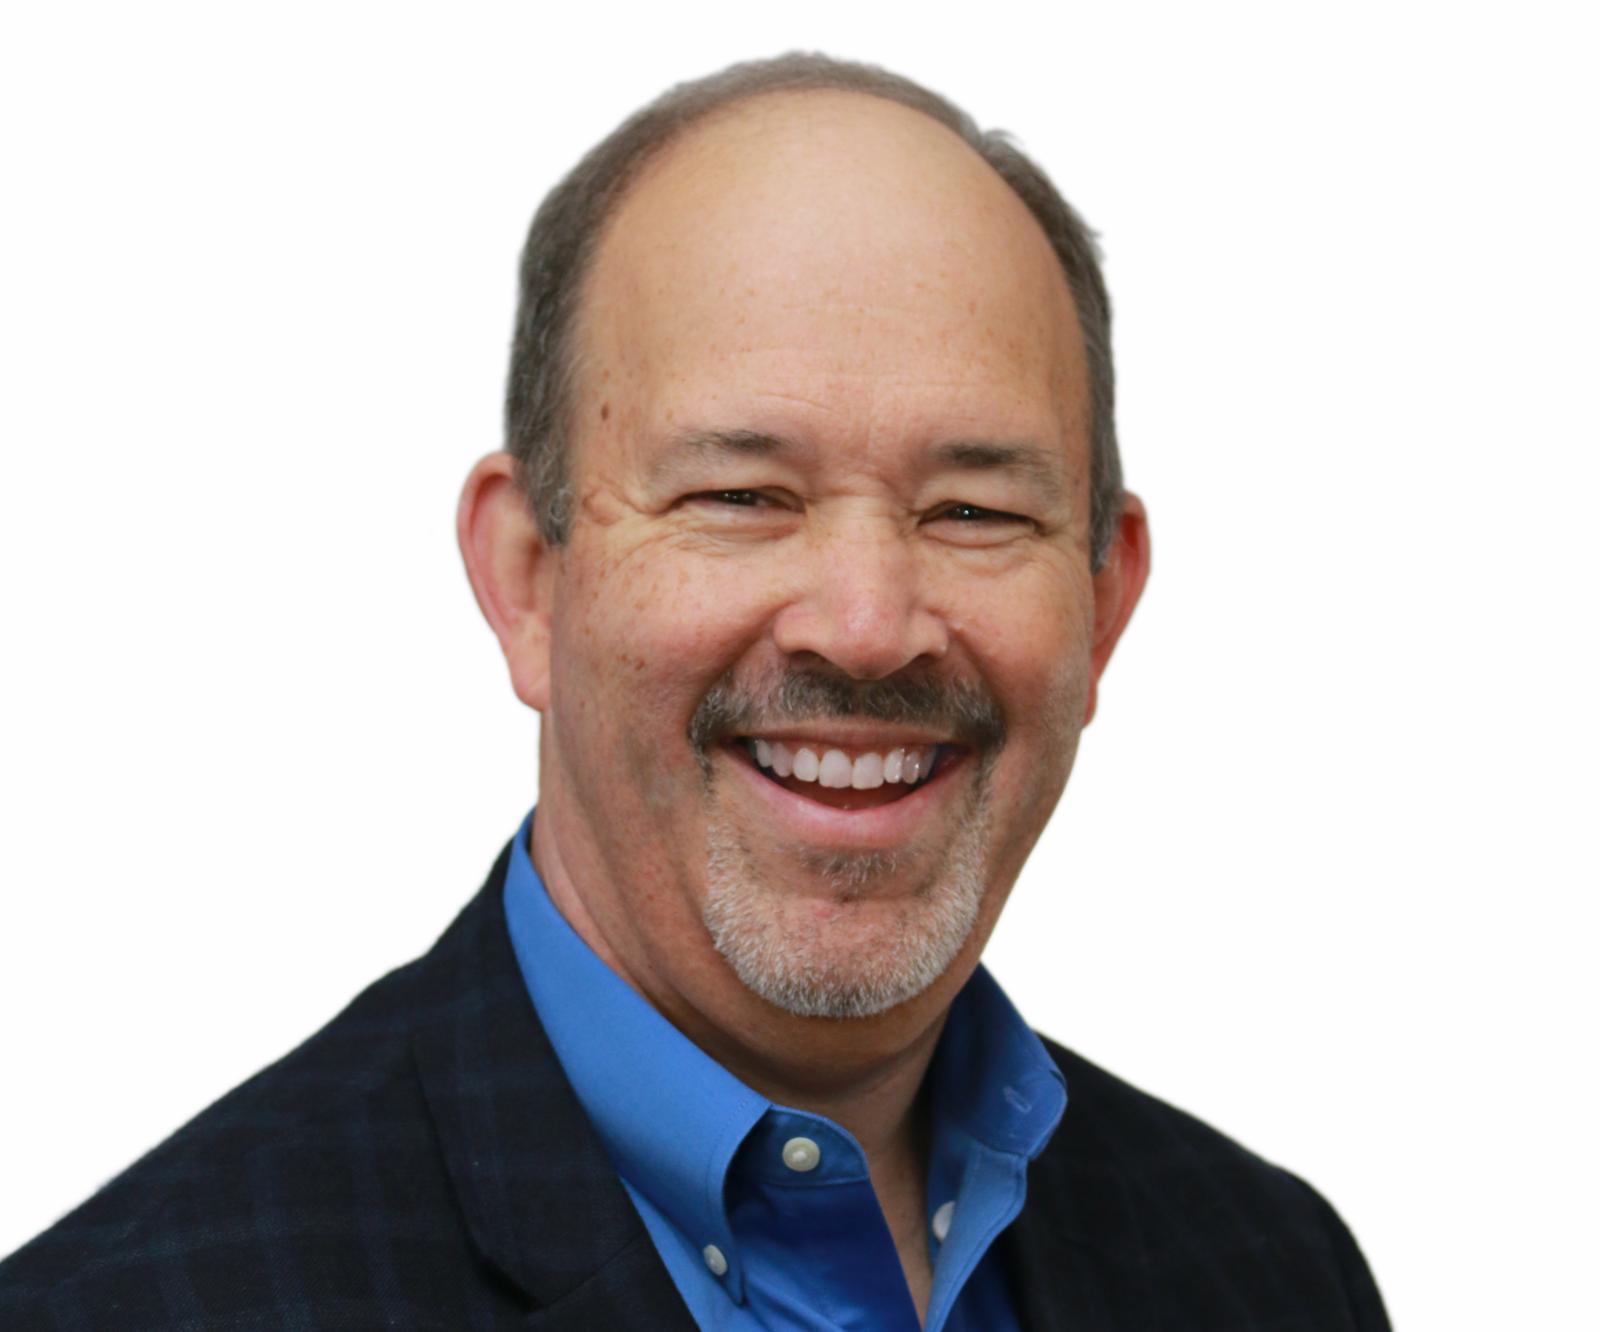 Rev. Doug Conley - District Superintendent